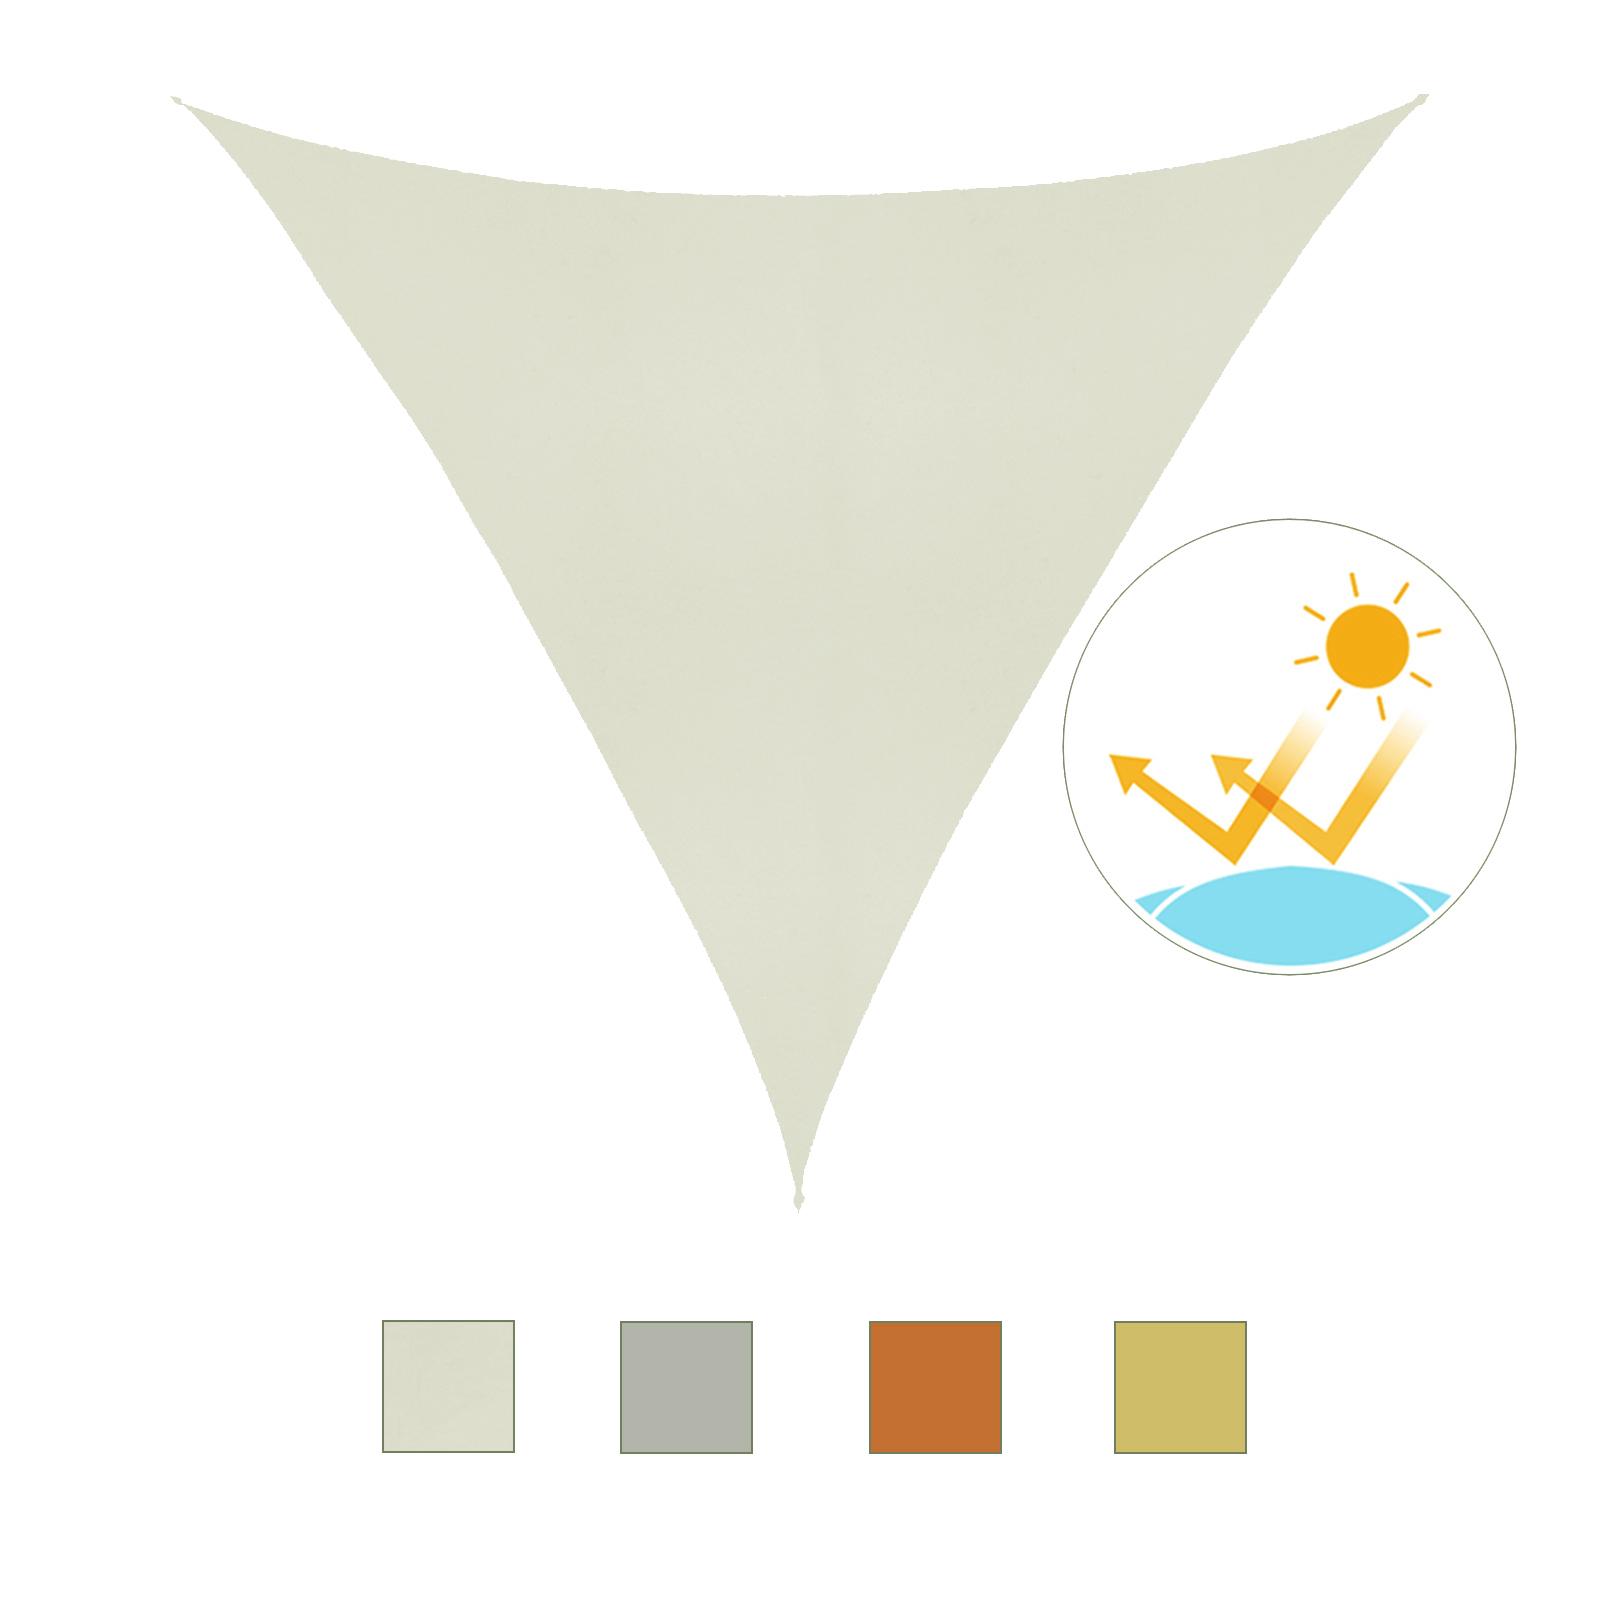 Toldo-Vela-Sombrilla-Parasol-Triangulo-Tejido-de-Poliester-160g-m2-Jardin-Playa miniatura 10